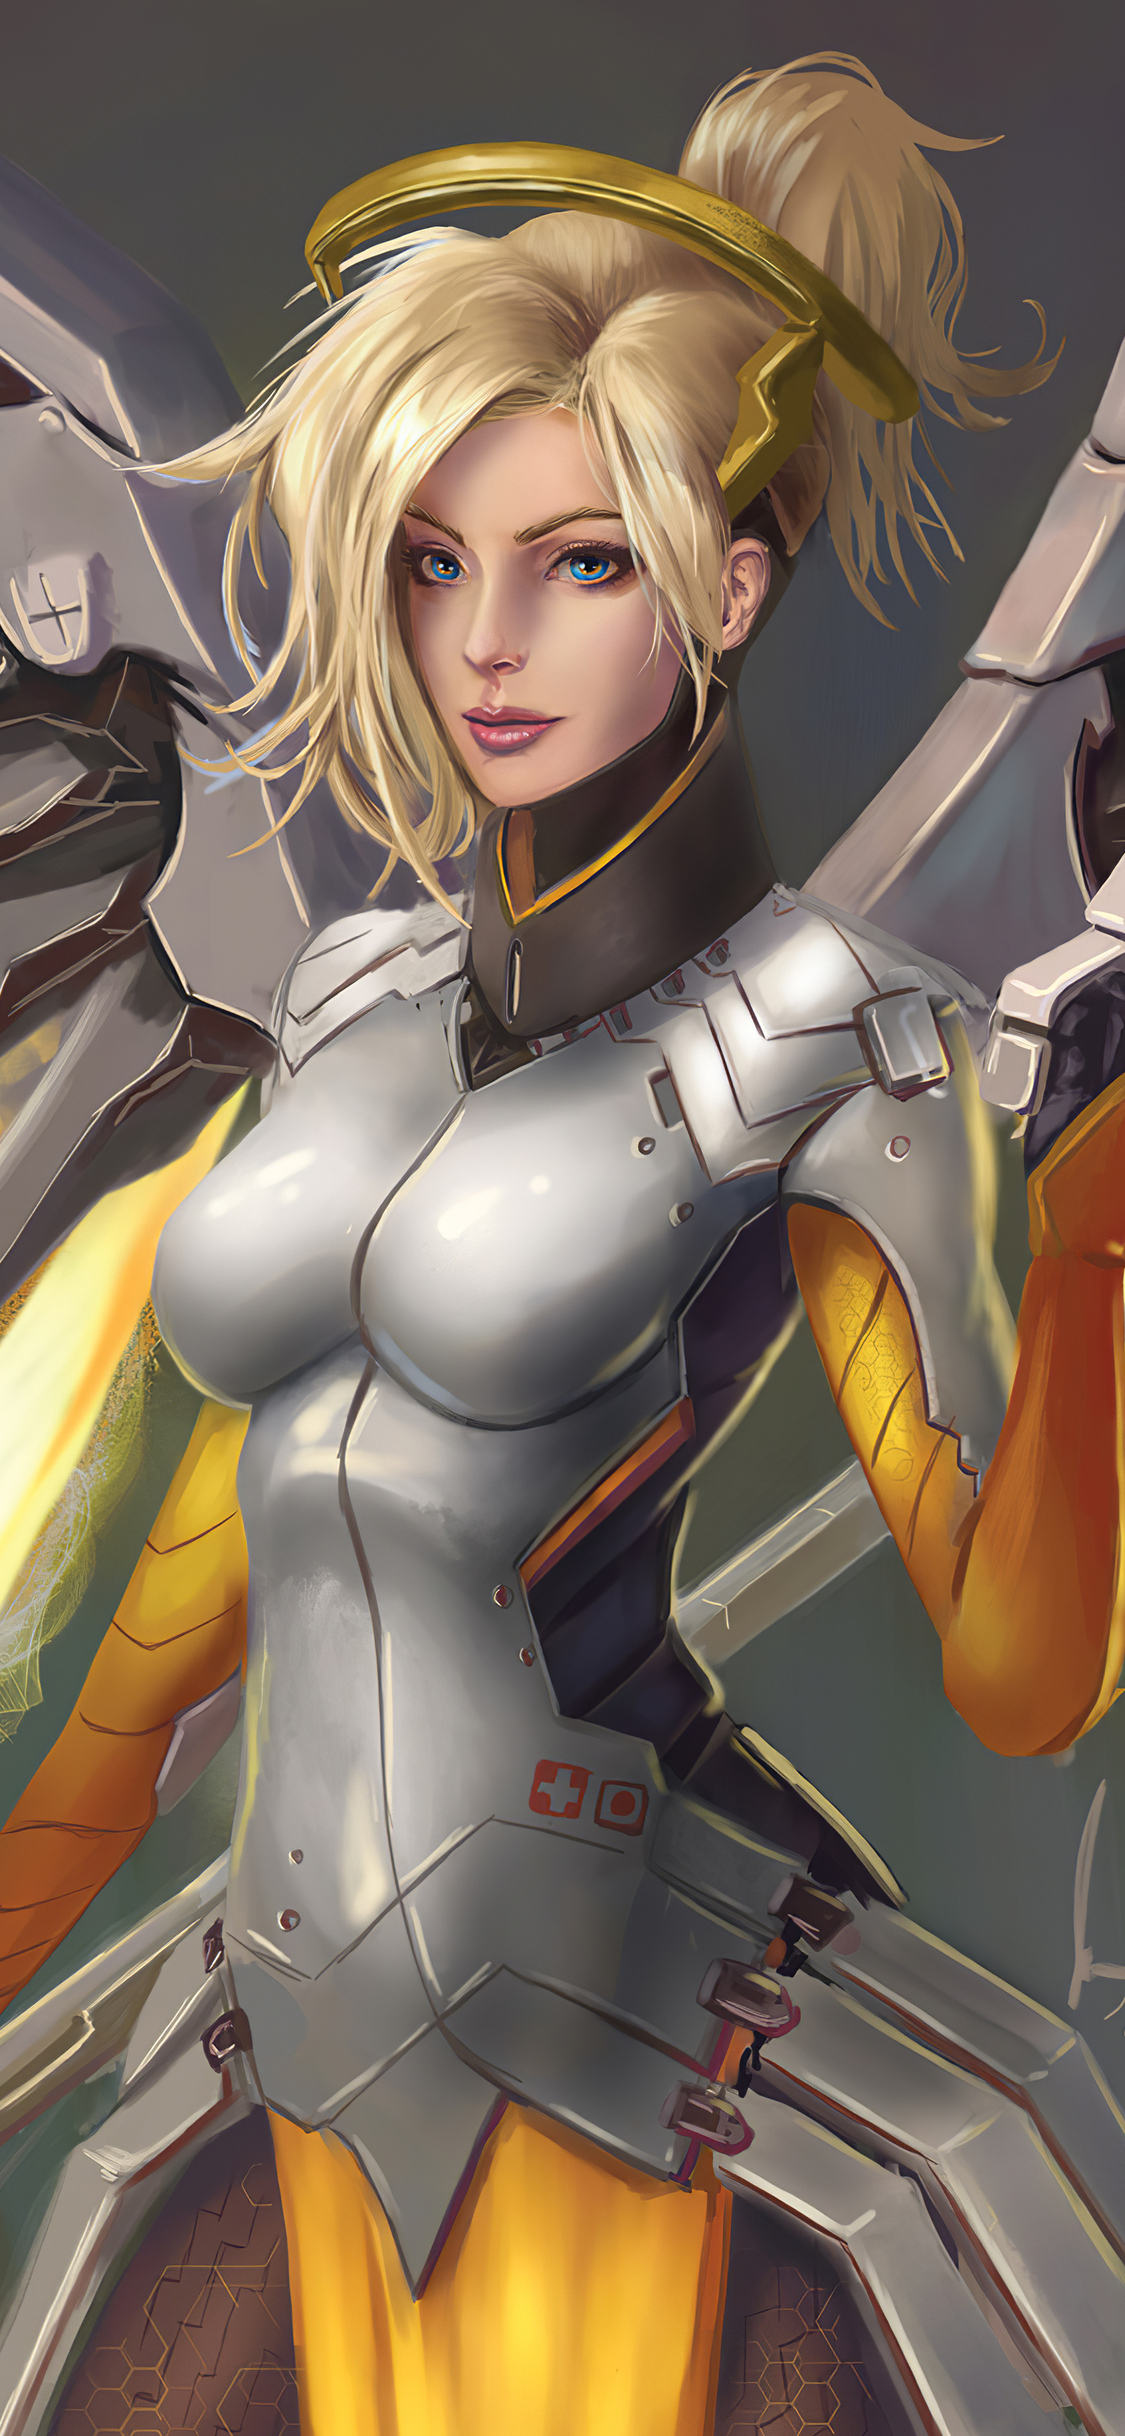 mercy-overwatch-2-artwork-4k-9m.jpg